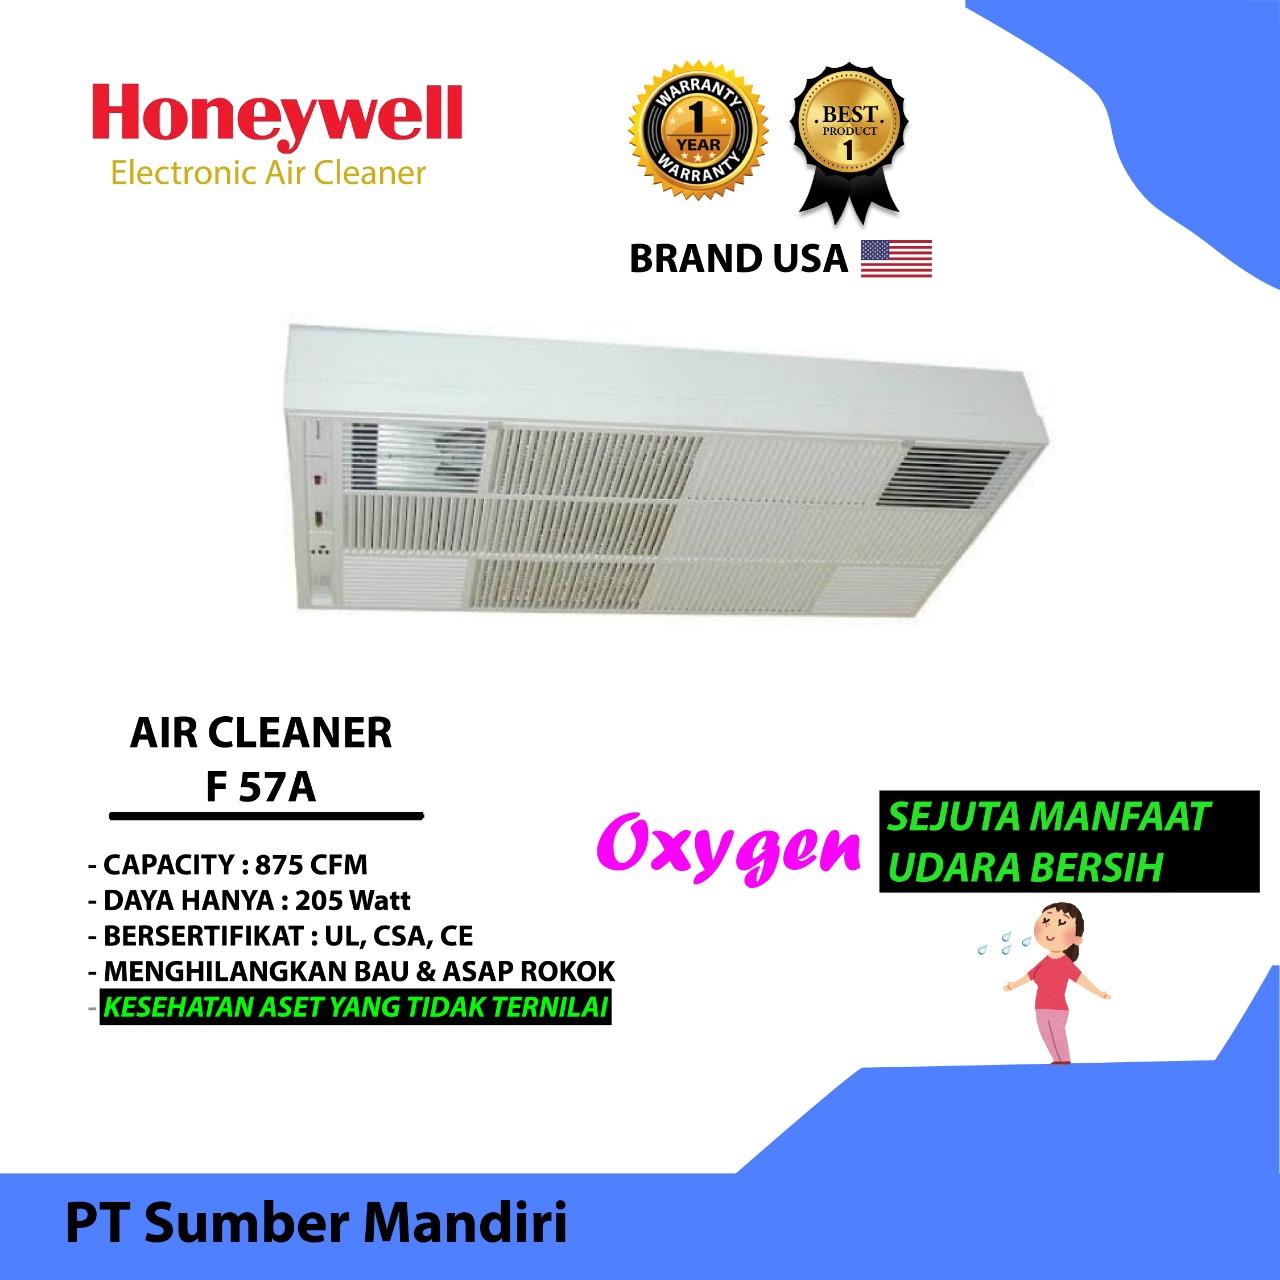 Air Cleaner Honeywell F 57A